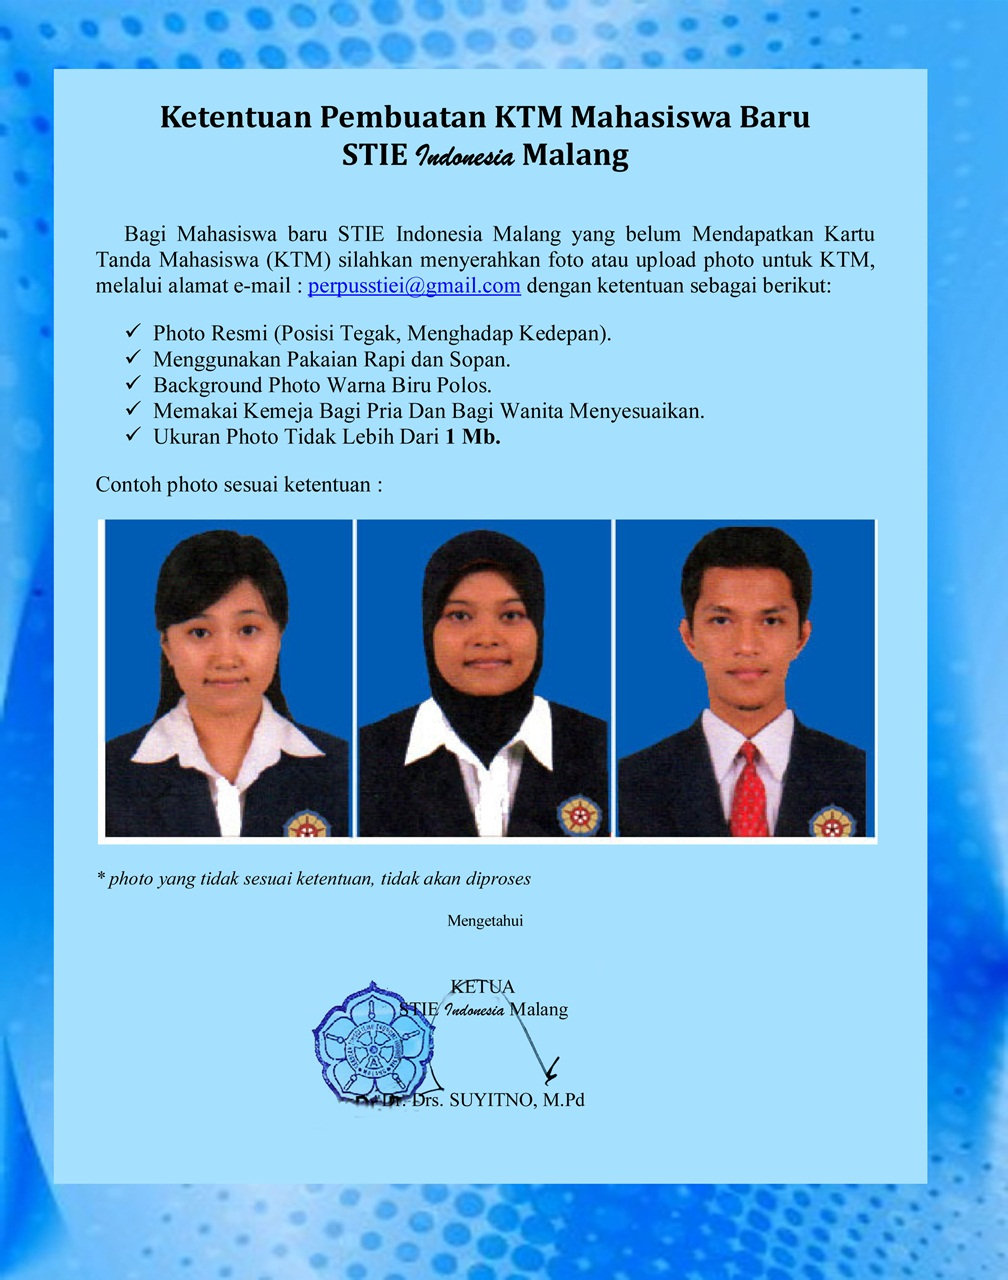 ktm-stie-indonesia-malang-2016